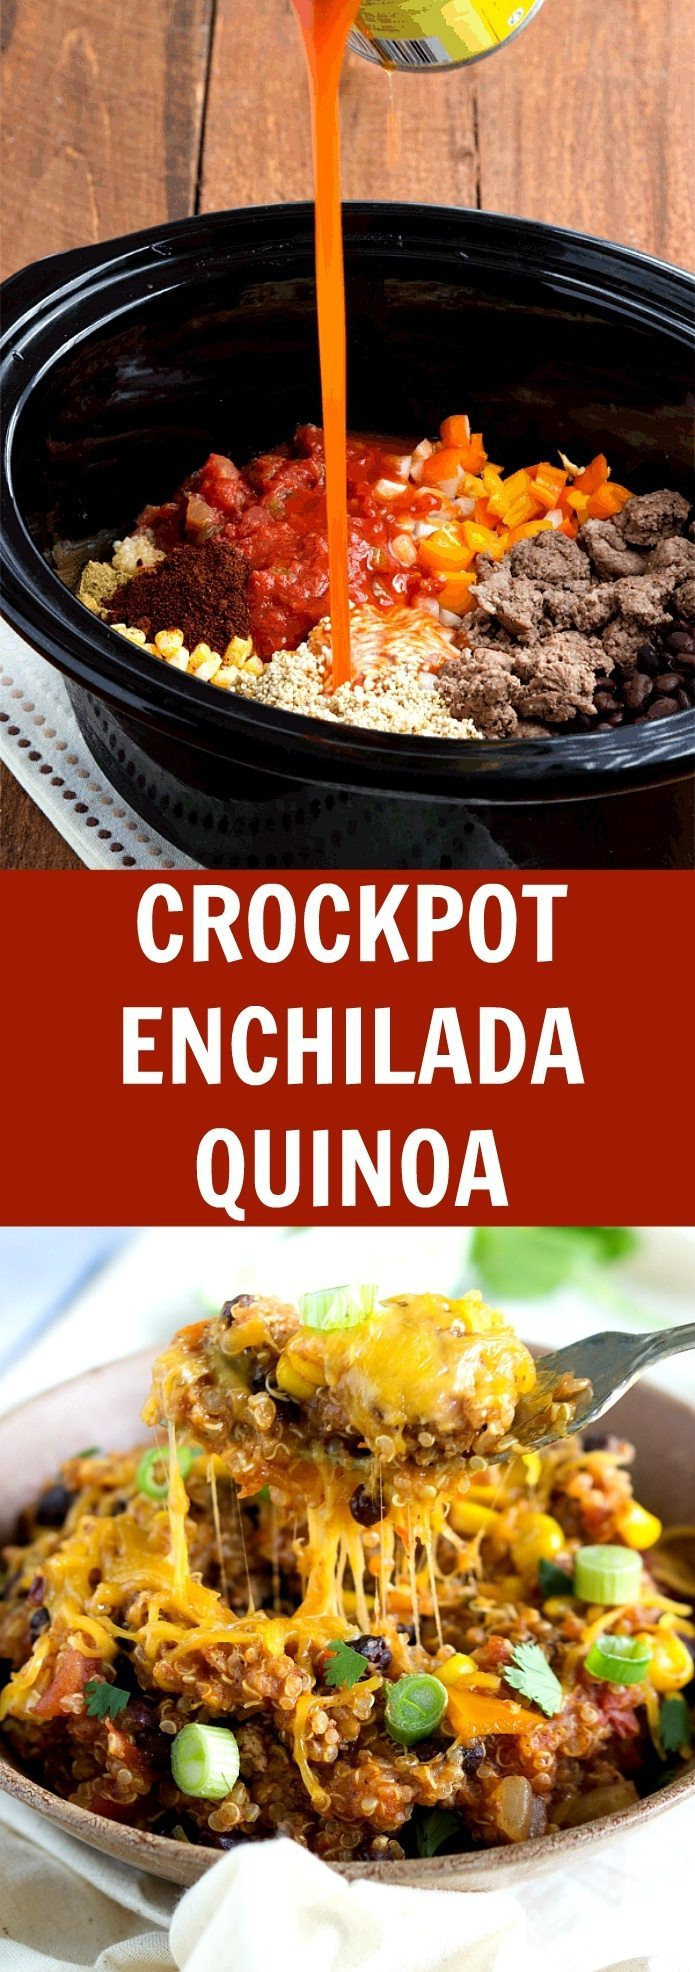 Slow Cooker Enchilada Quinoa  Slow Cooker Cheesy Enchilada Quinoa Bake Chelsea s Messy